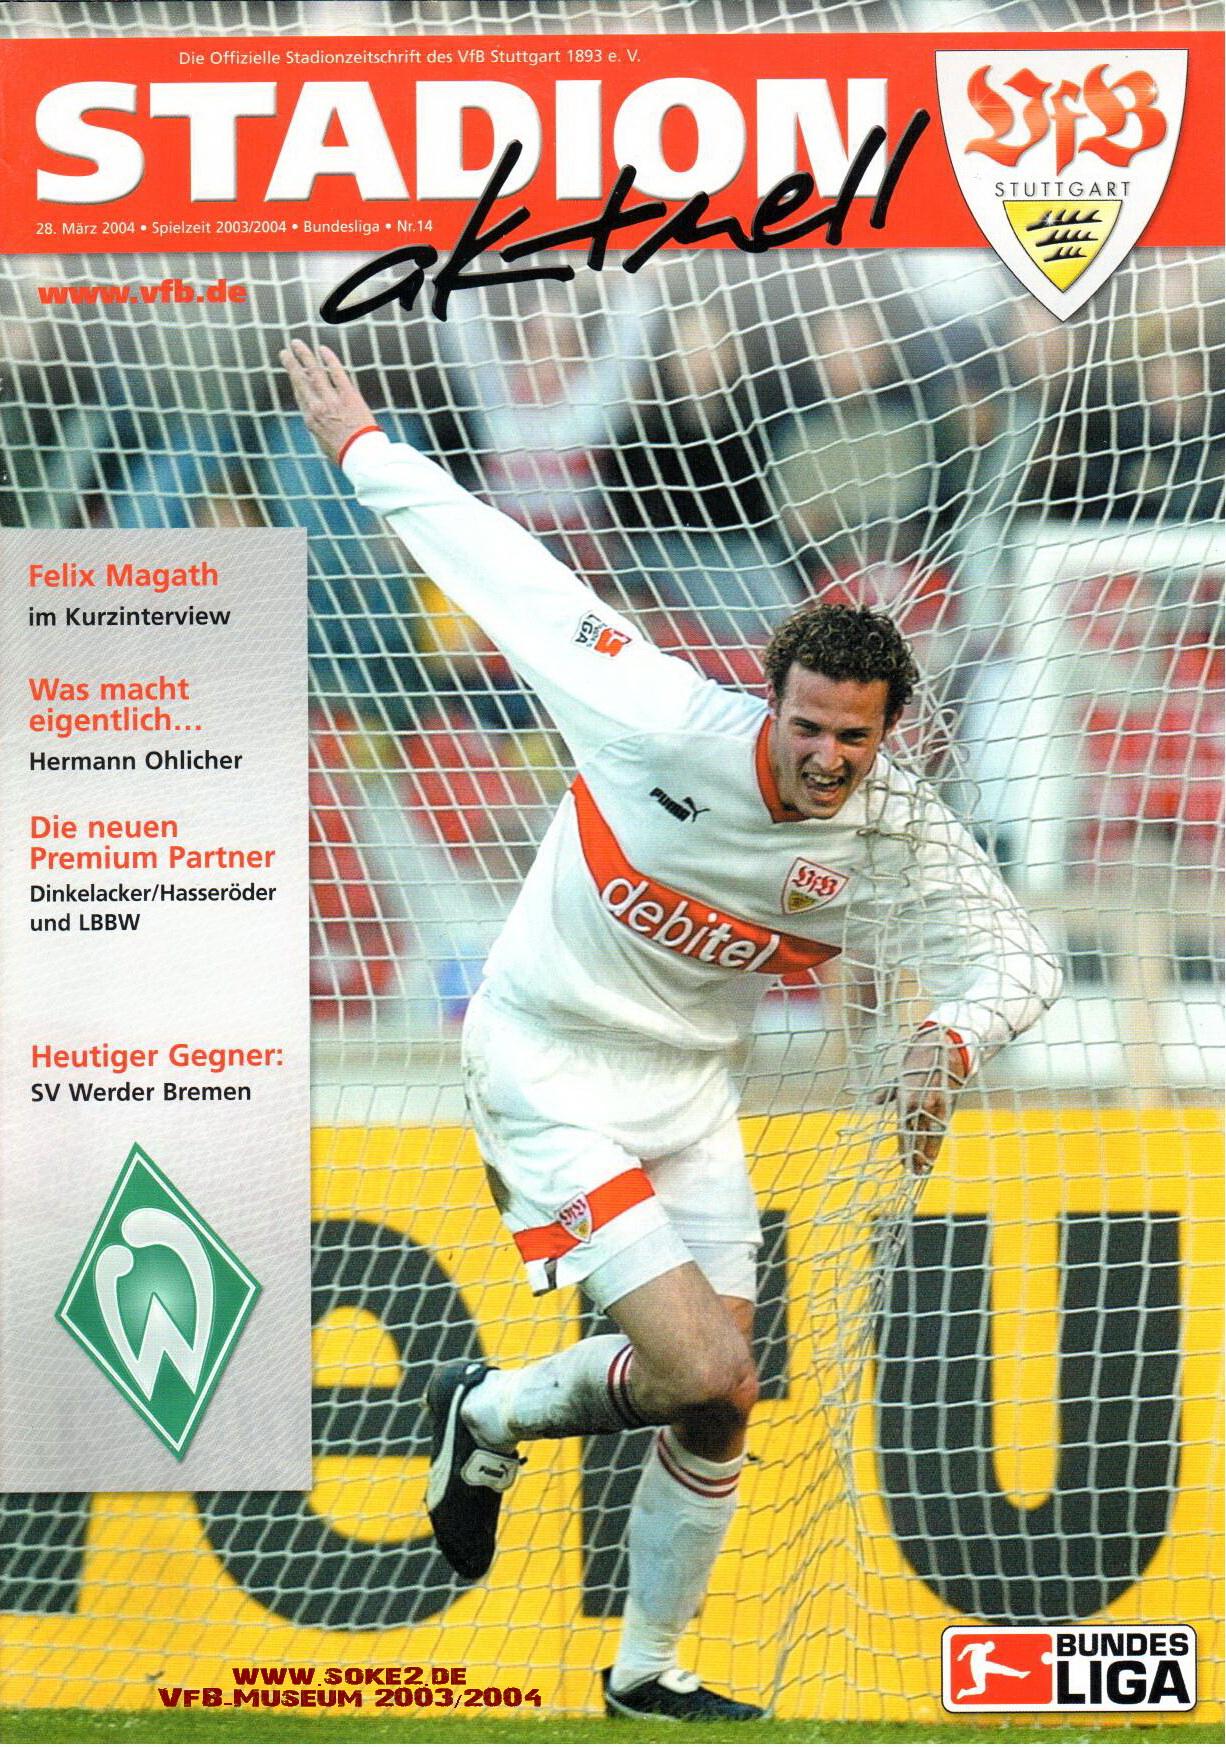 040328_Heft_VfB_Stuttgart_Werder_Bremen_Soke2